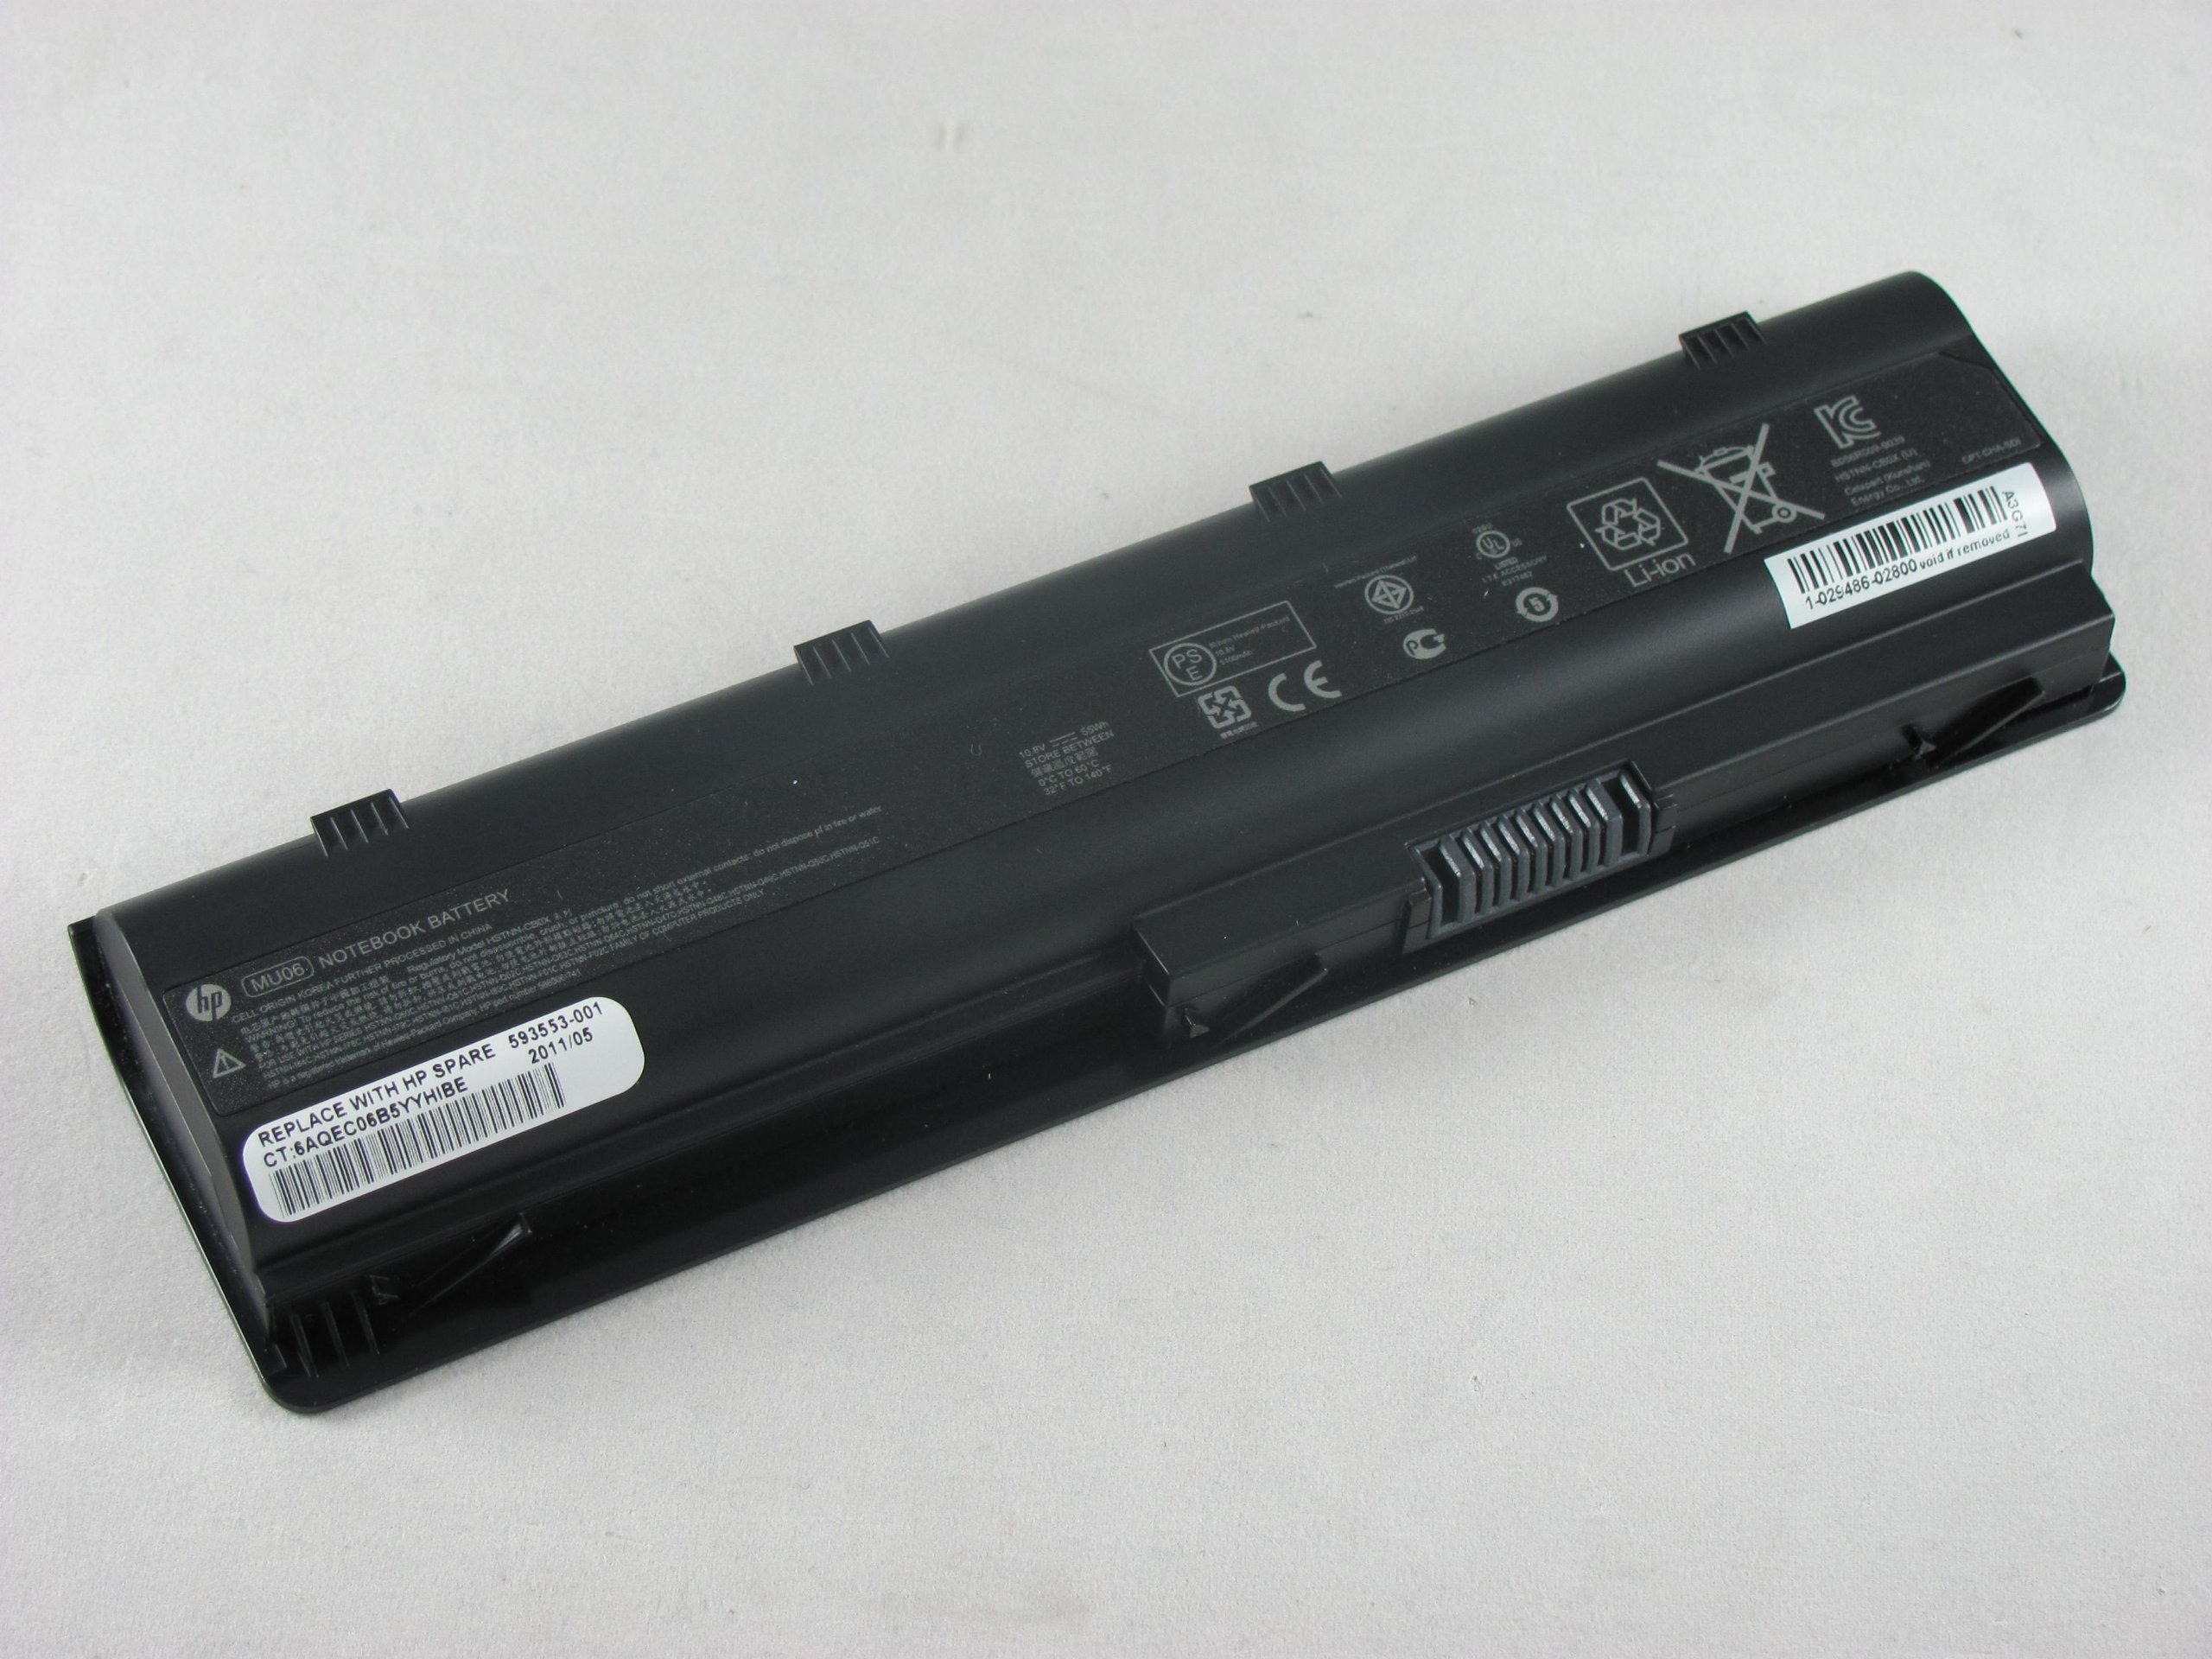 593553-001 - New HP Original Battery - MU06